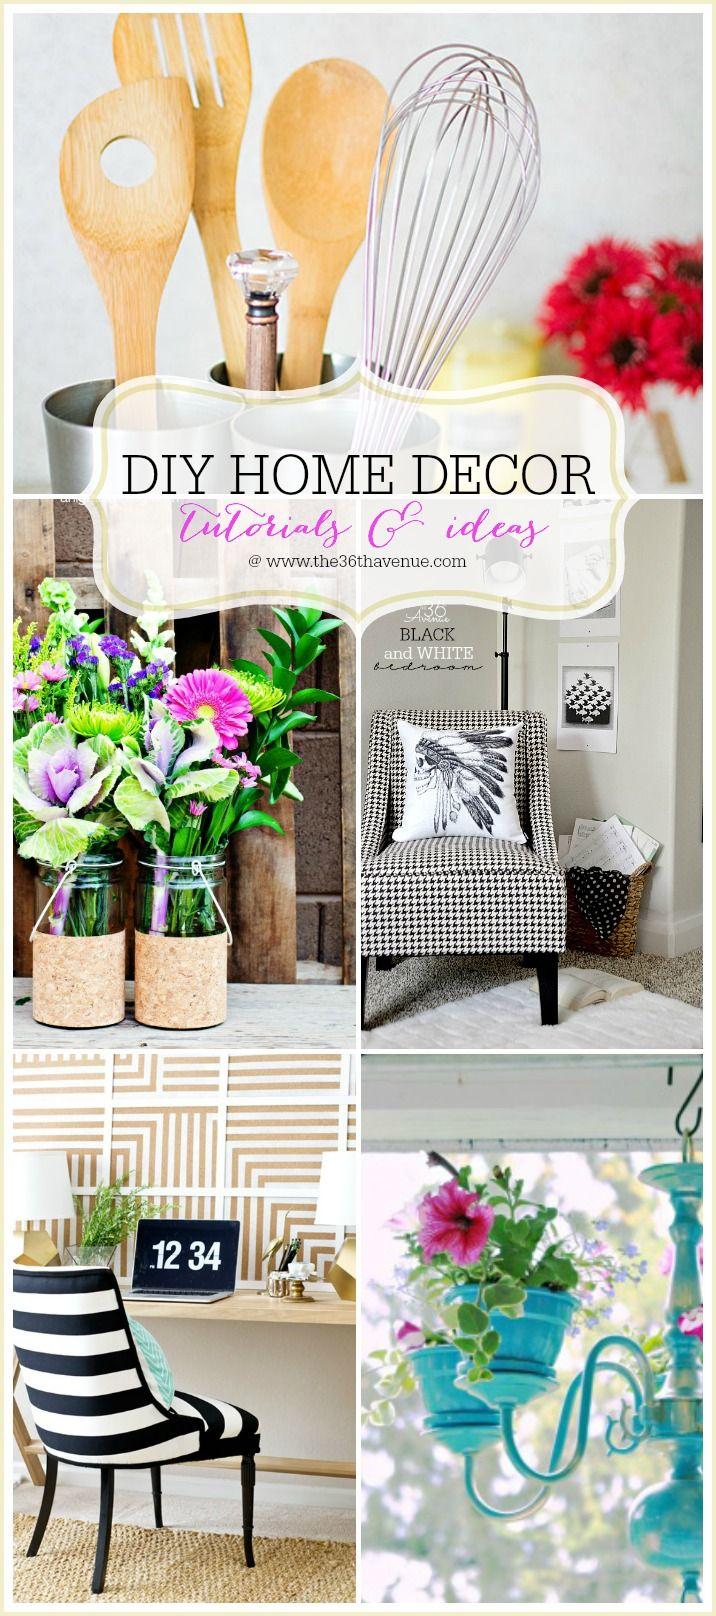 The 20th AVENUE   Home Decor DIY Projects   Decor tutorials, Diy ...